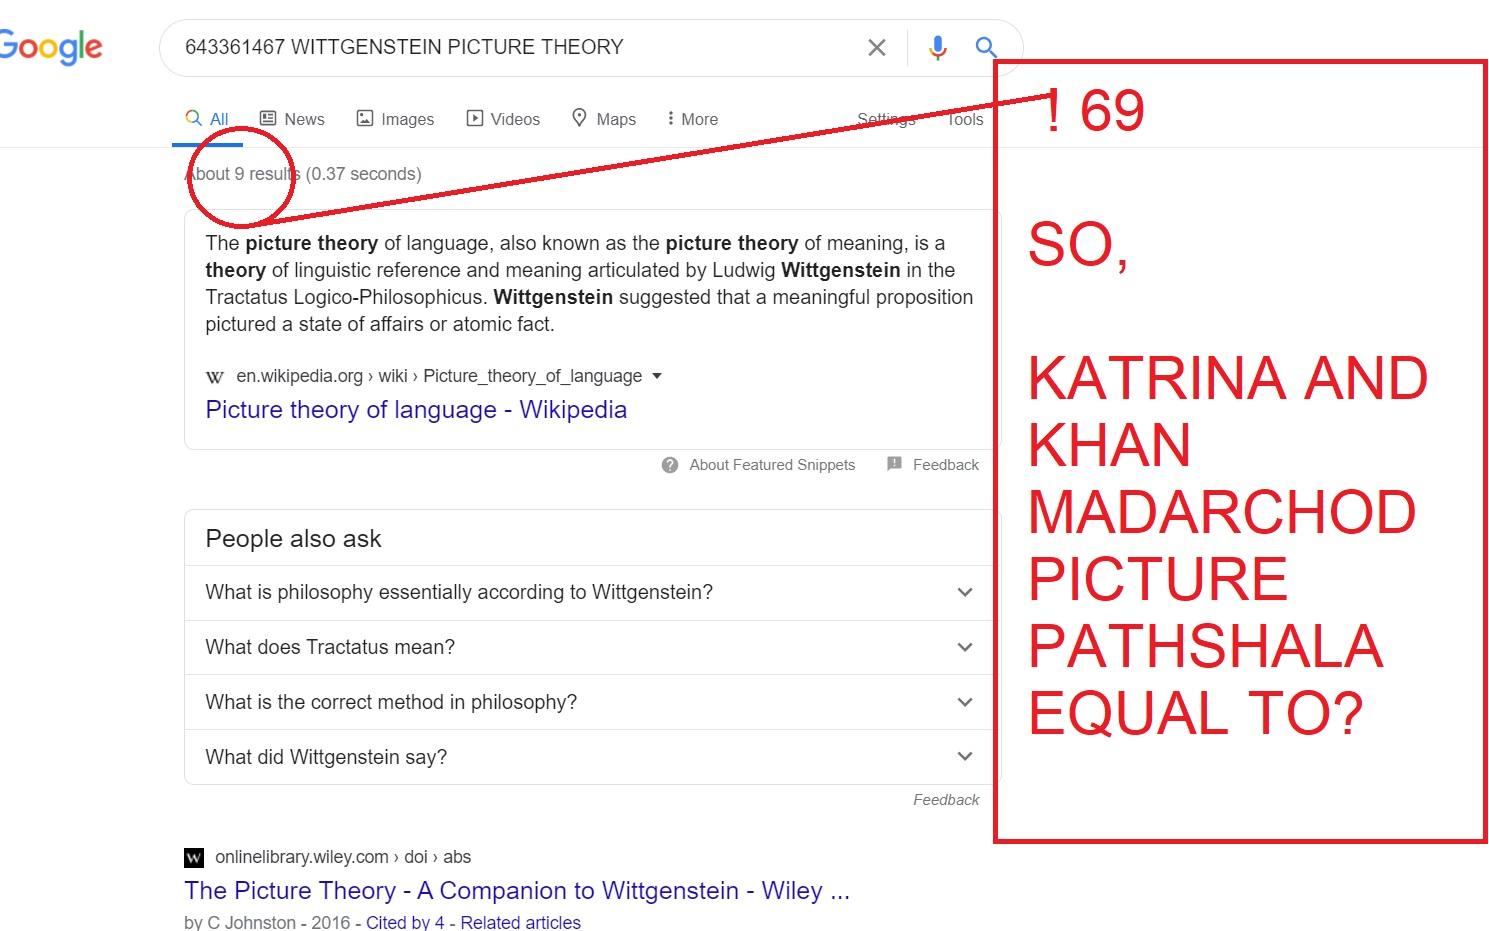 WITTGENSTEIN PICTURE PATHSHALA TO KATRINA KAIF AN D SALMAN KHAN AND OTHER KHANS